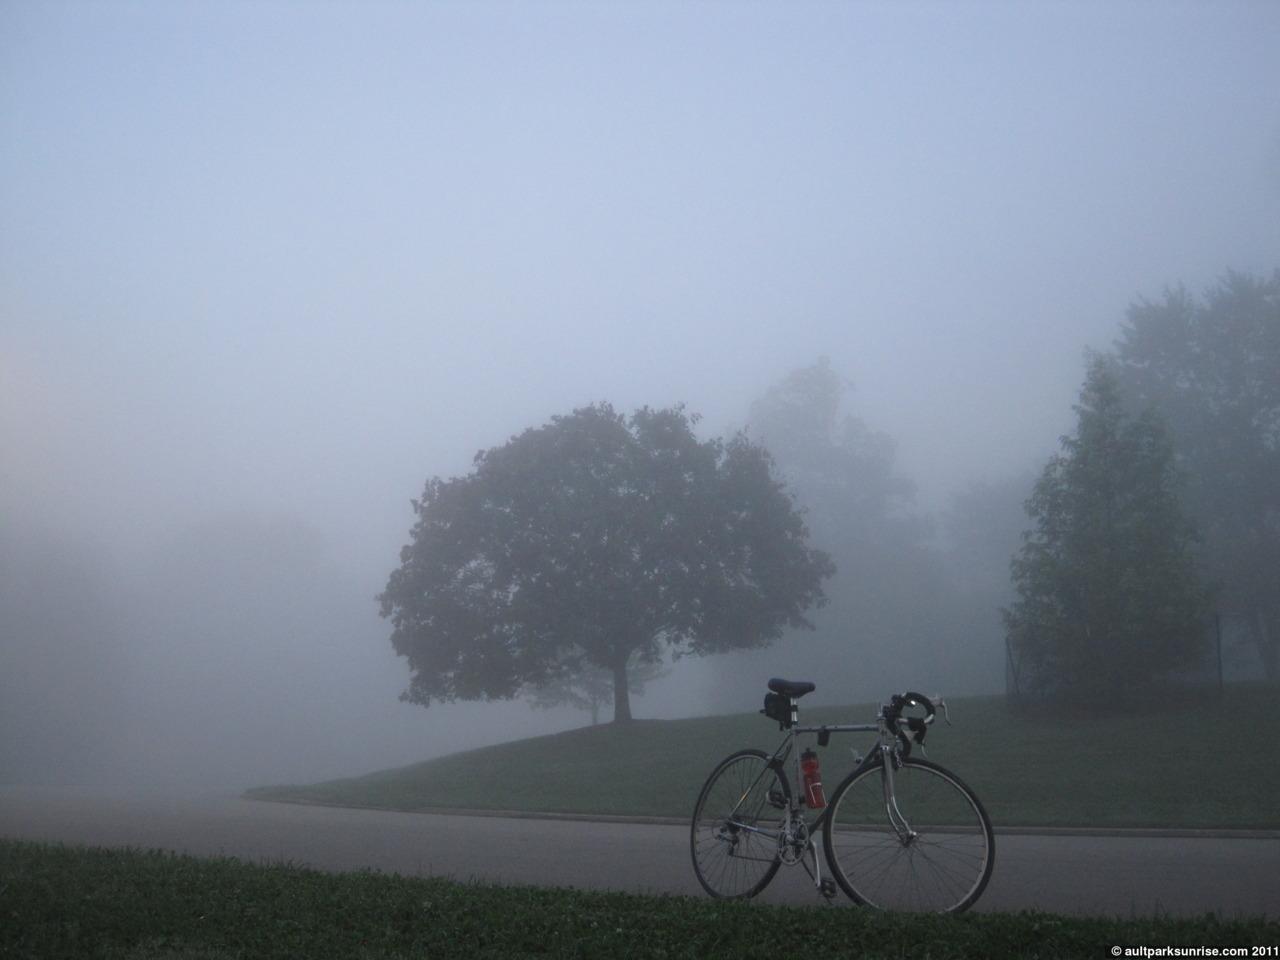 Sunrise 98: Ault Park (Foggy Park, Foggy Forest, and Observatory Fog)